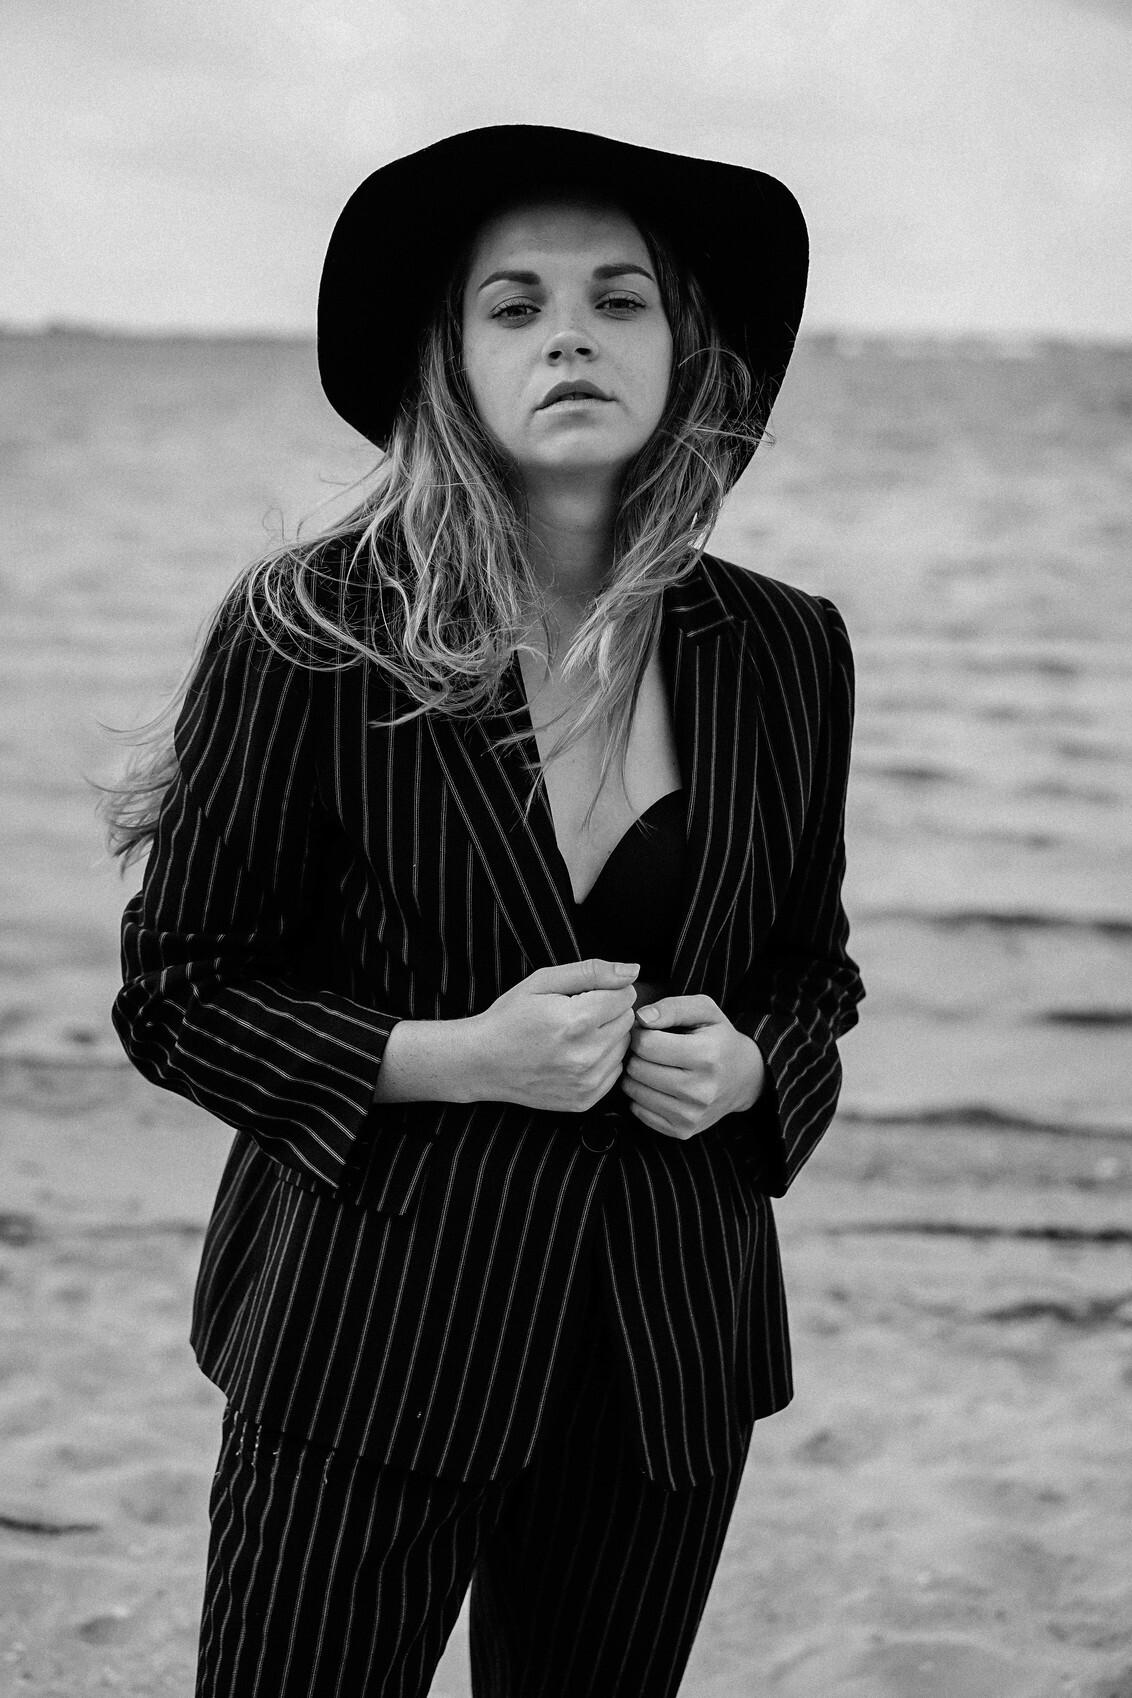 Vintage and dramatic - - - foto door Kayleesfotografie op 23-06-2017 - deze foto bevat: licht, portret, model, fashion, meisje, zwartwit, closeup, mode, fotoshoot, 50mm